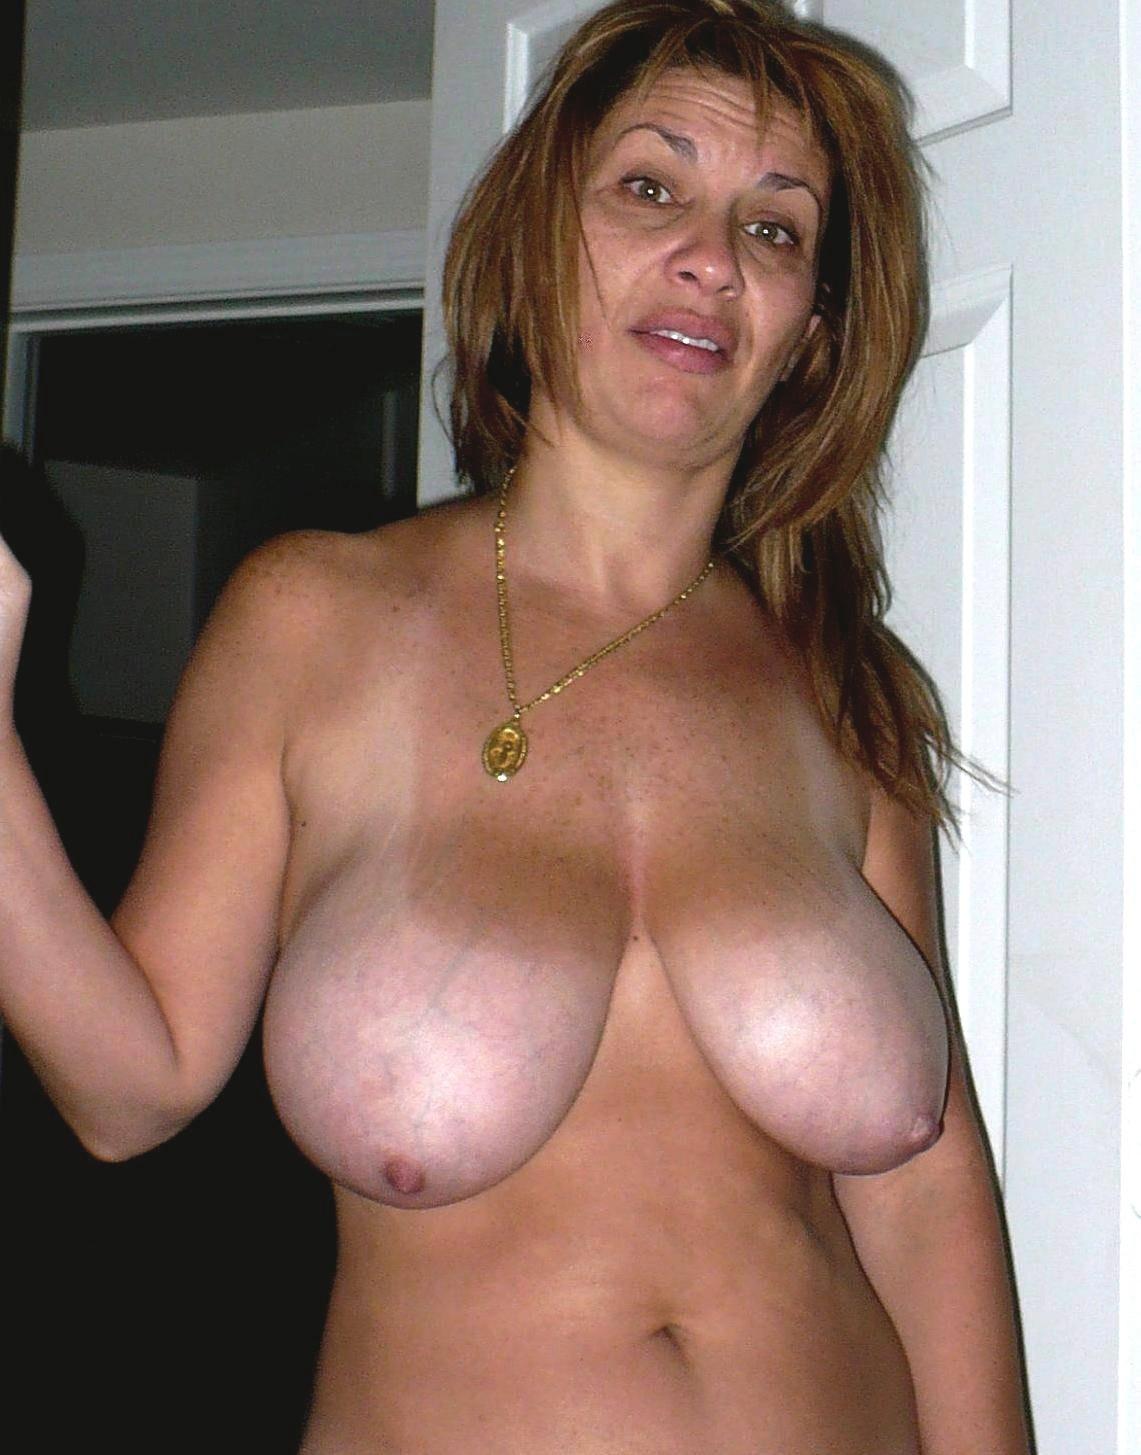 Mature women big curvy redhead boobs Kat